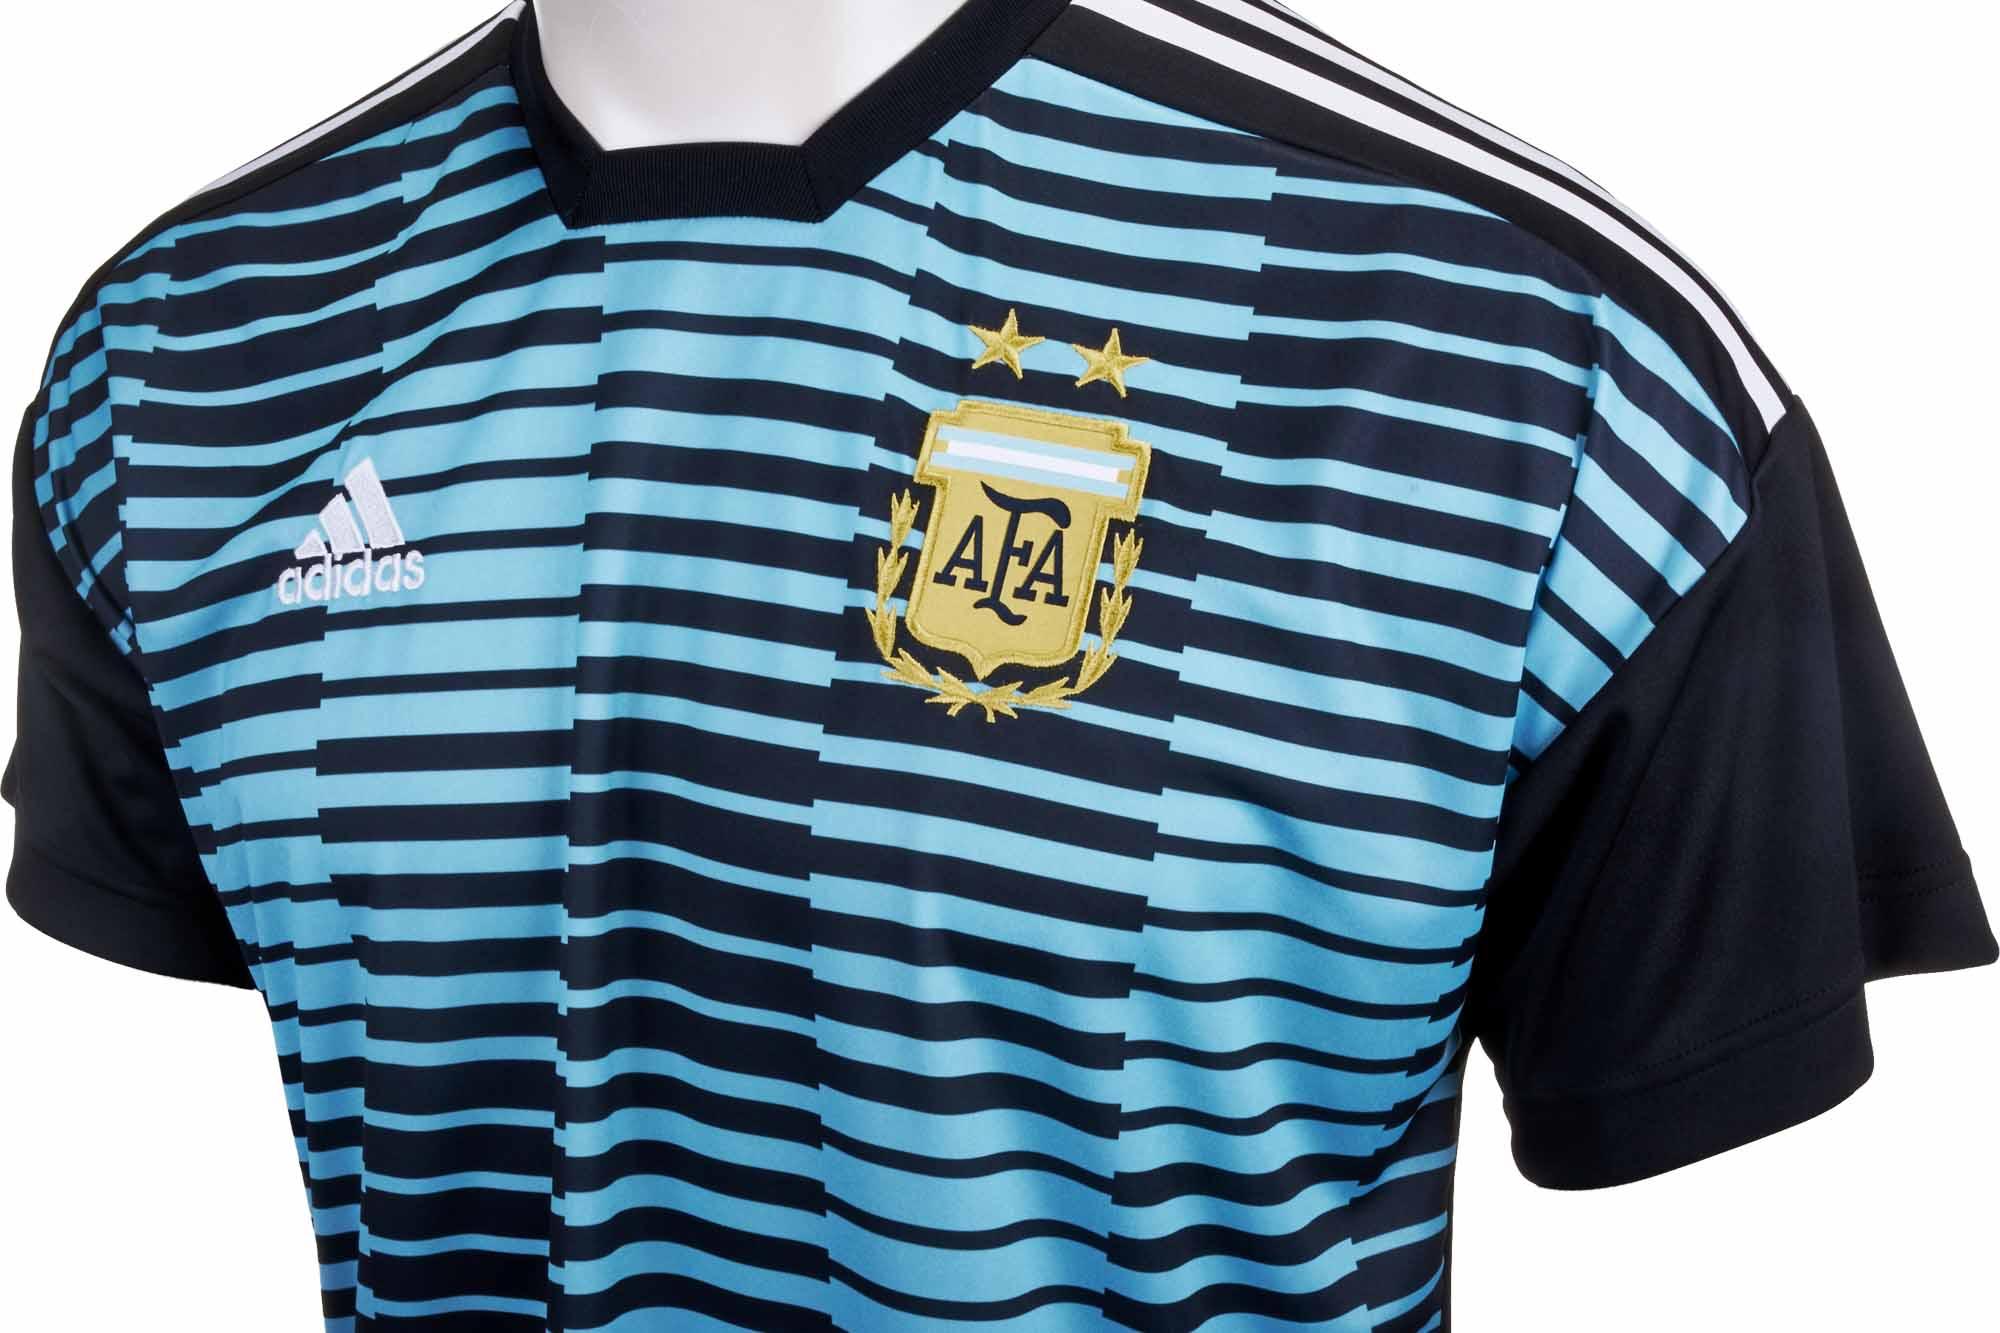 adidas Argentina Pre-match Jersey - Blue & Black - Soccer Master